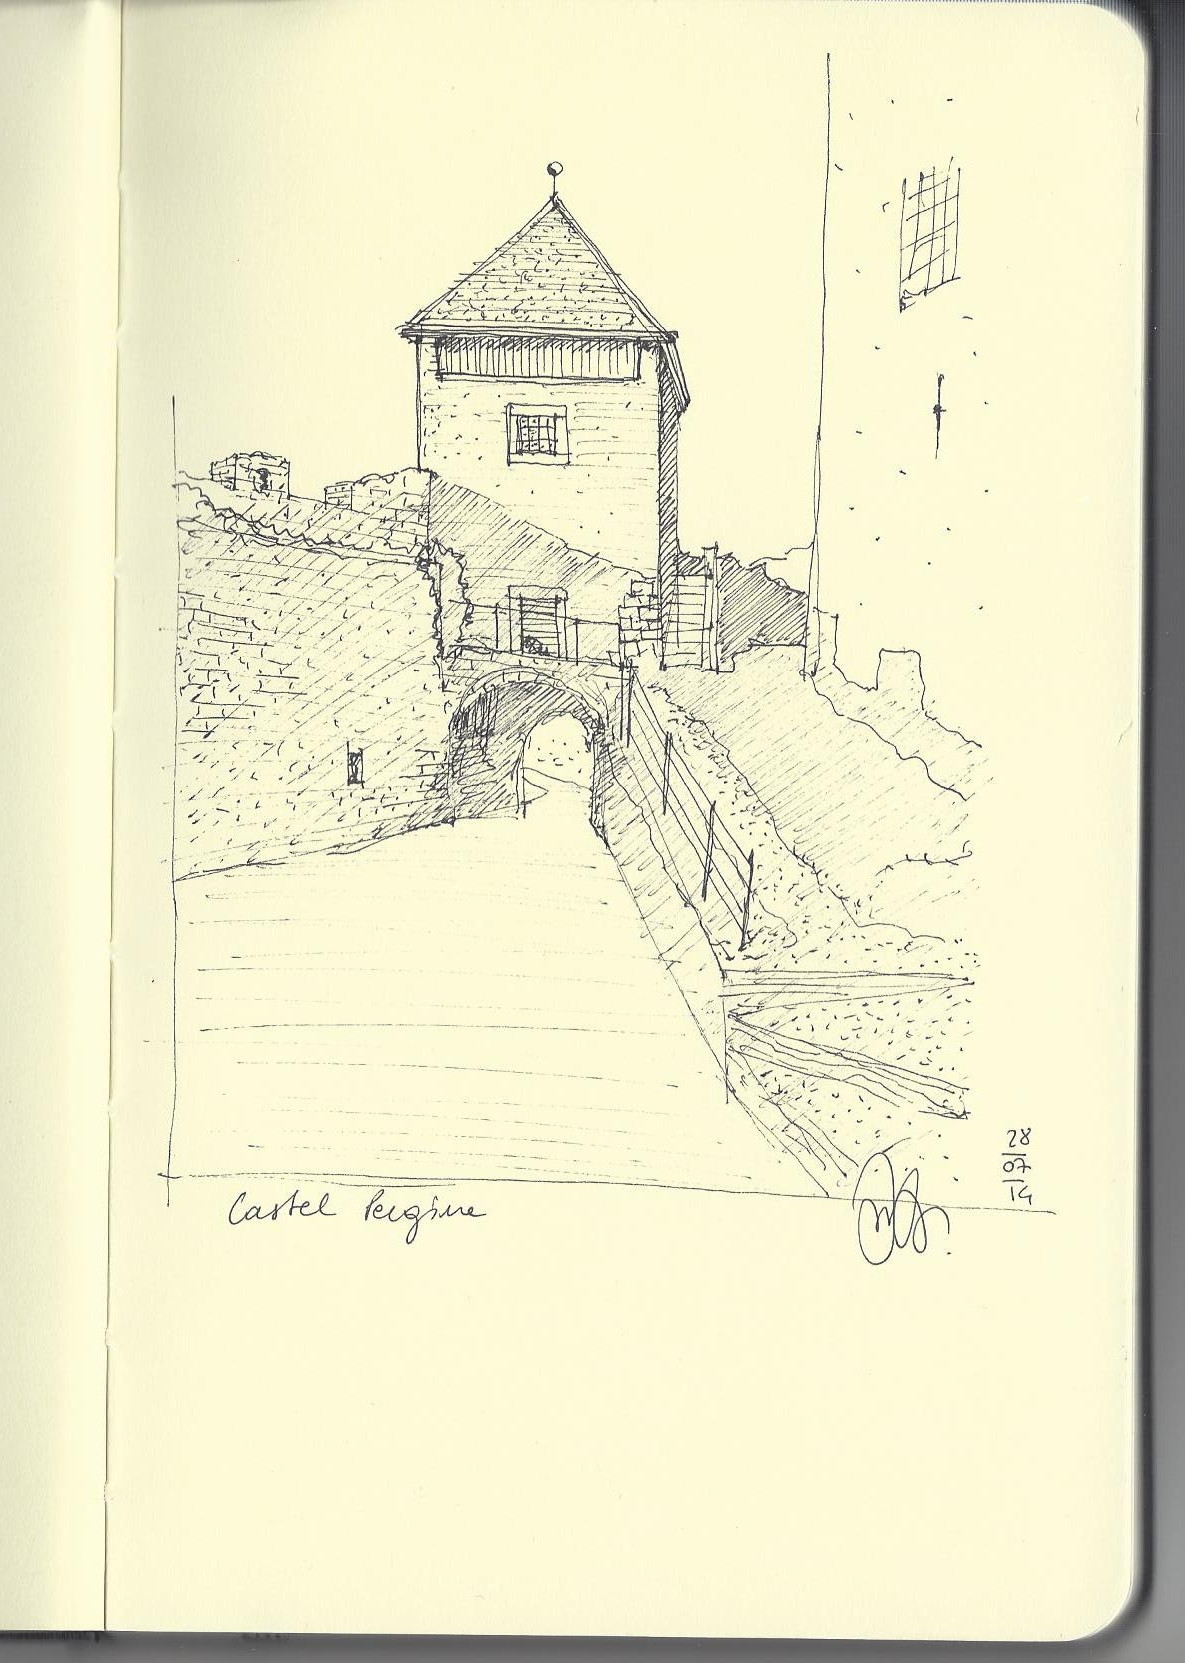 Castelpergine